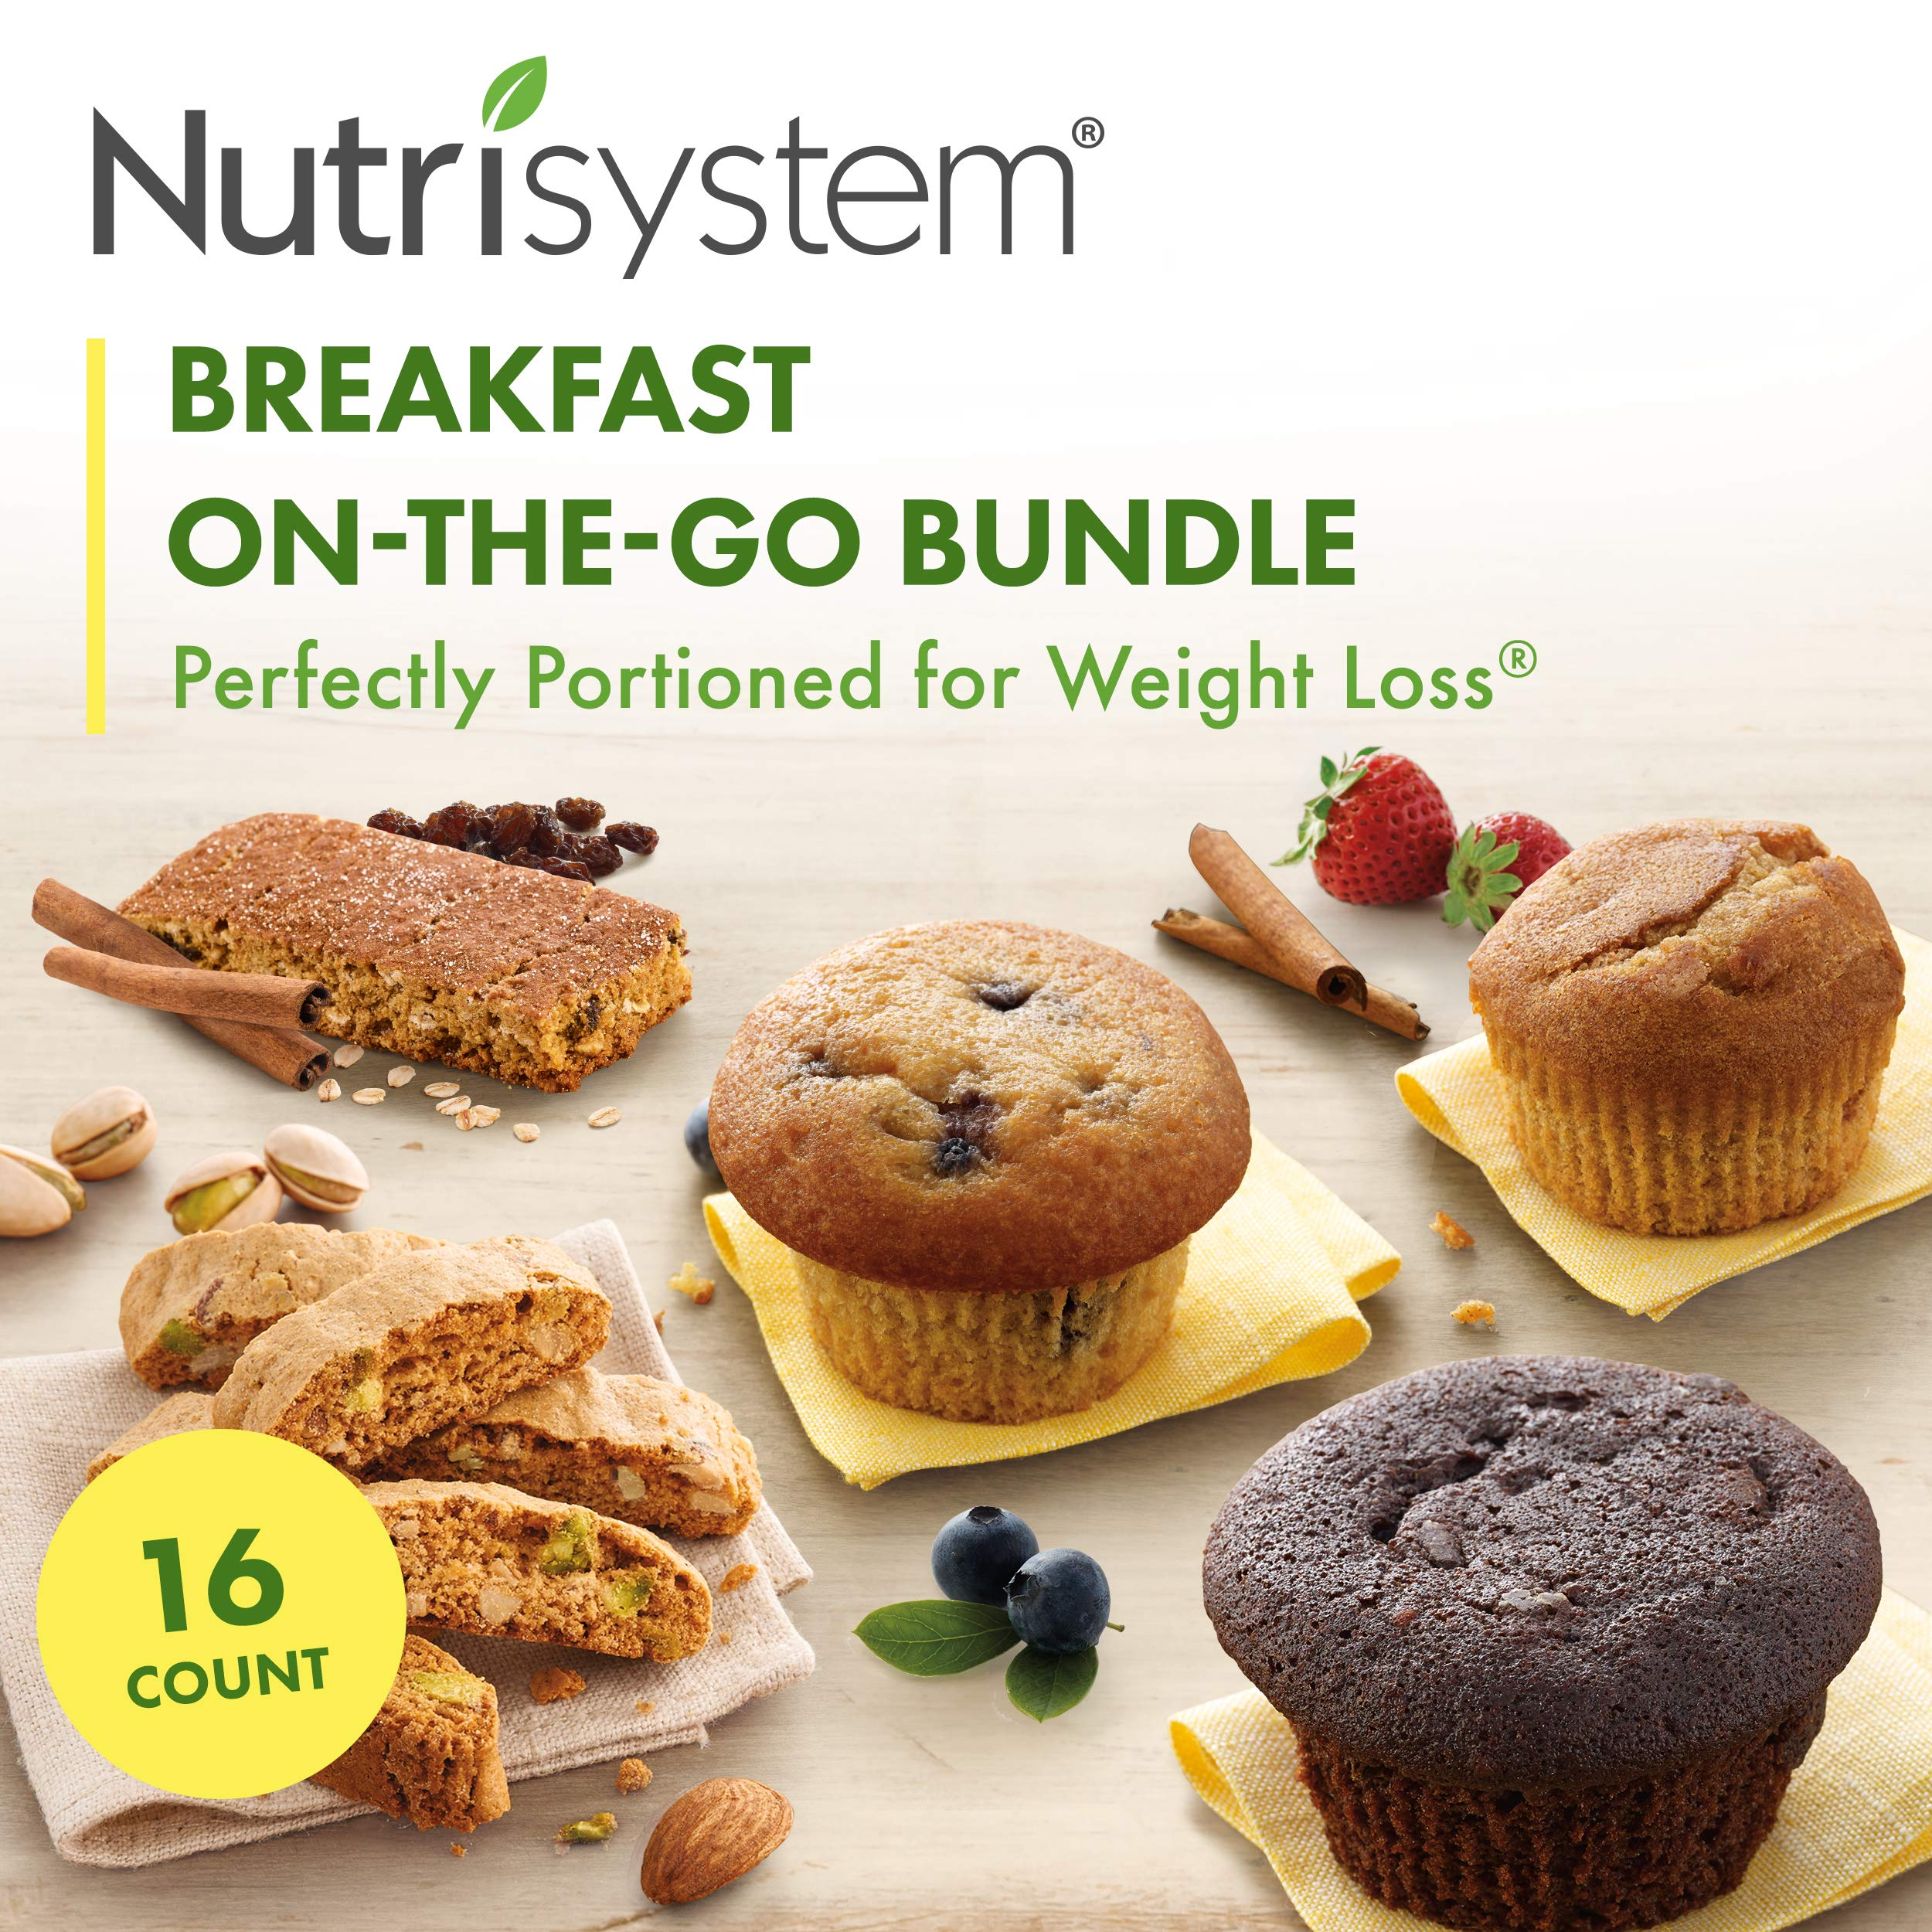 Nutrisystem NS85812 %C2%AE Breakfast On The Go Bundle 16ct